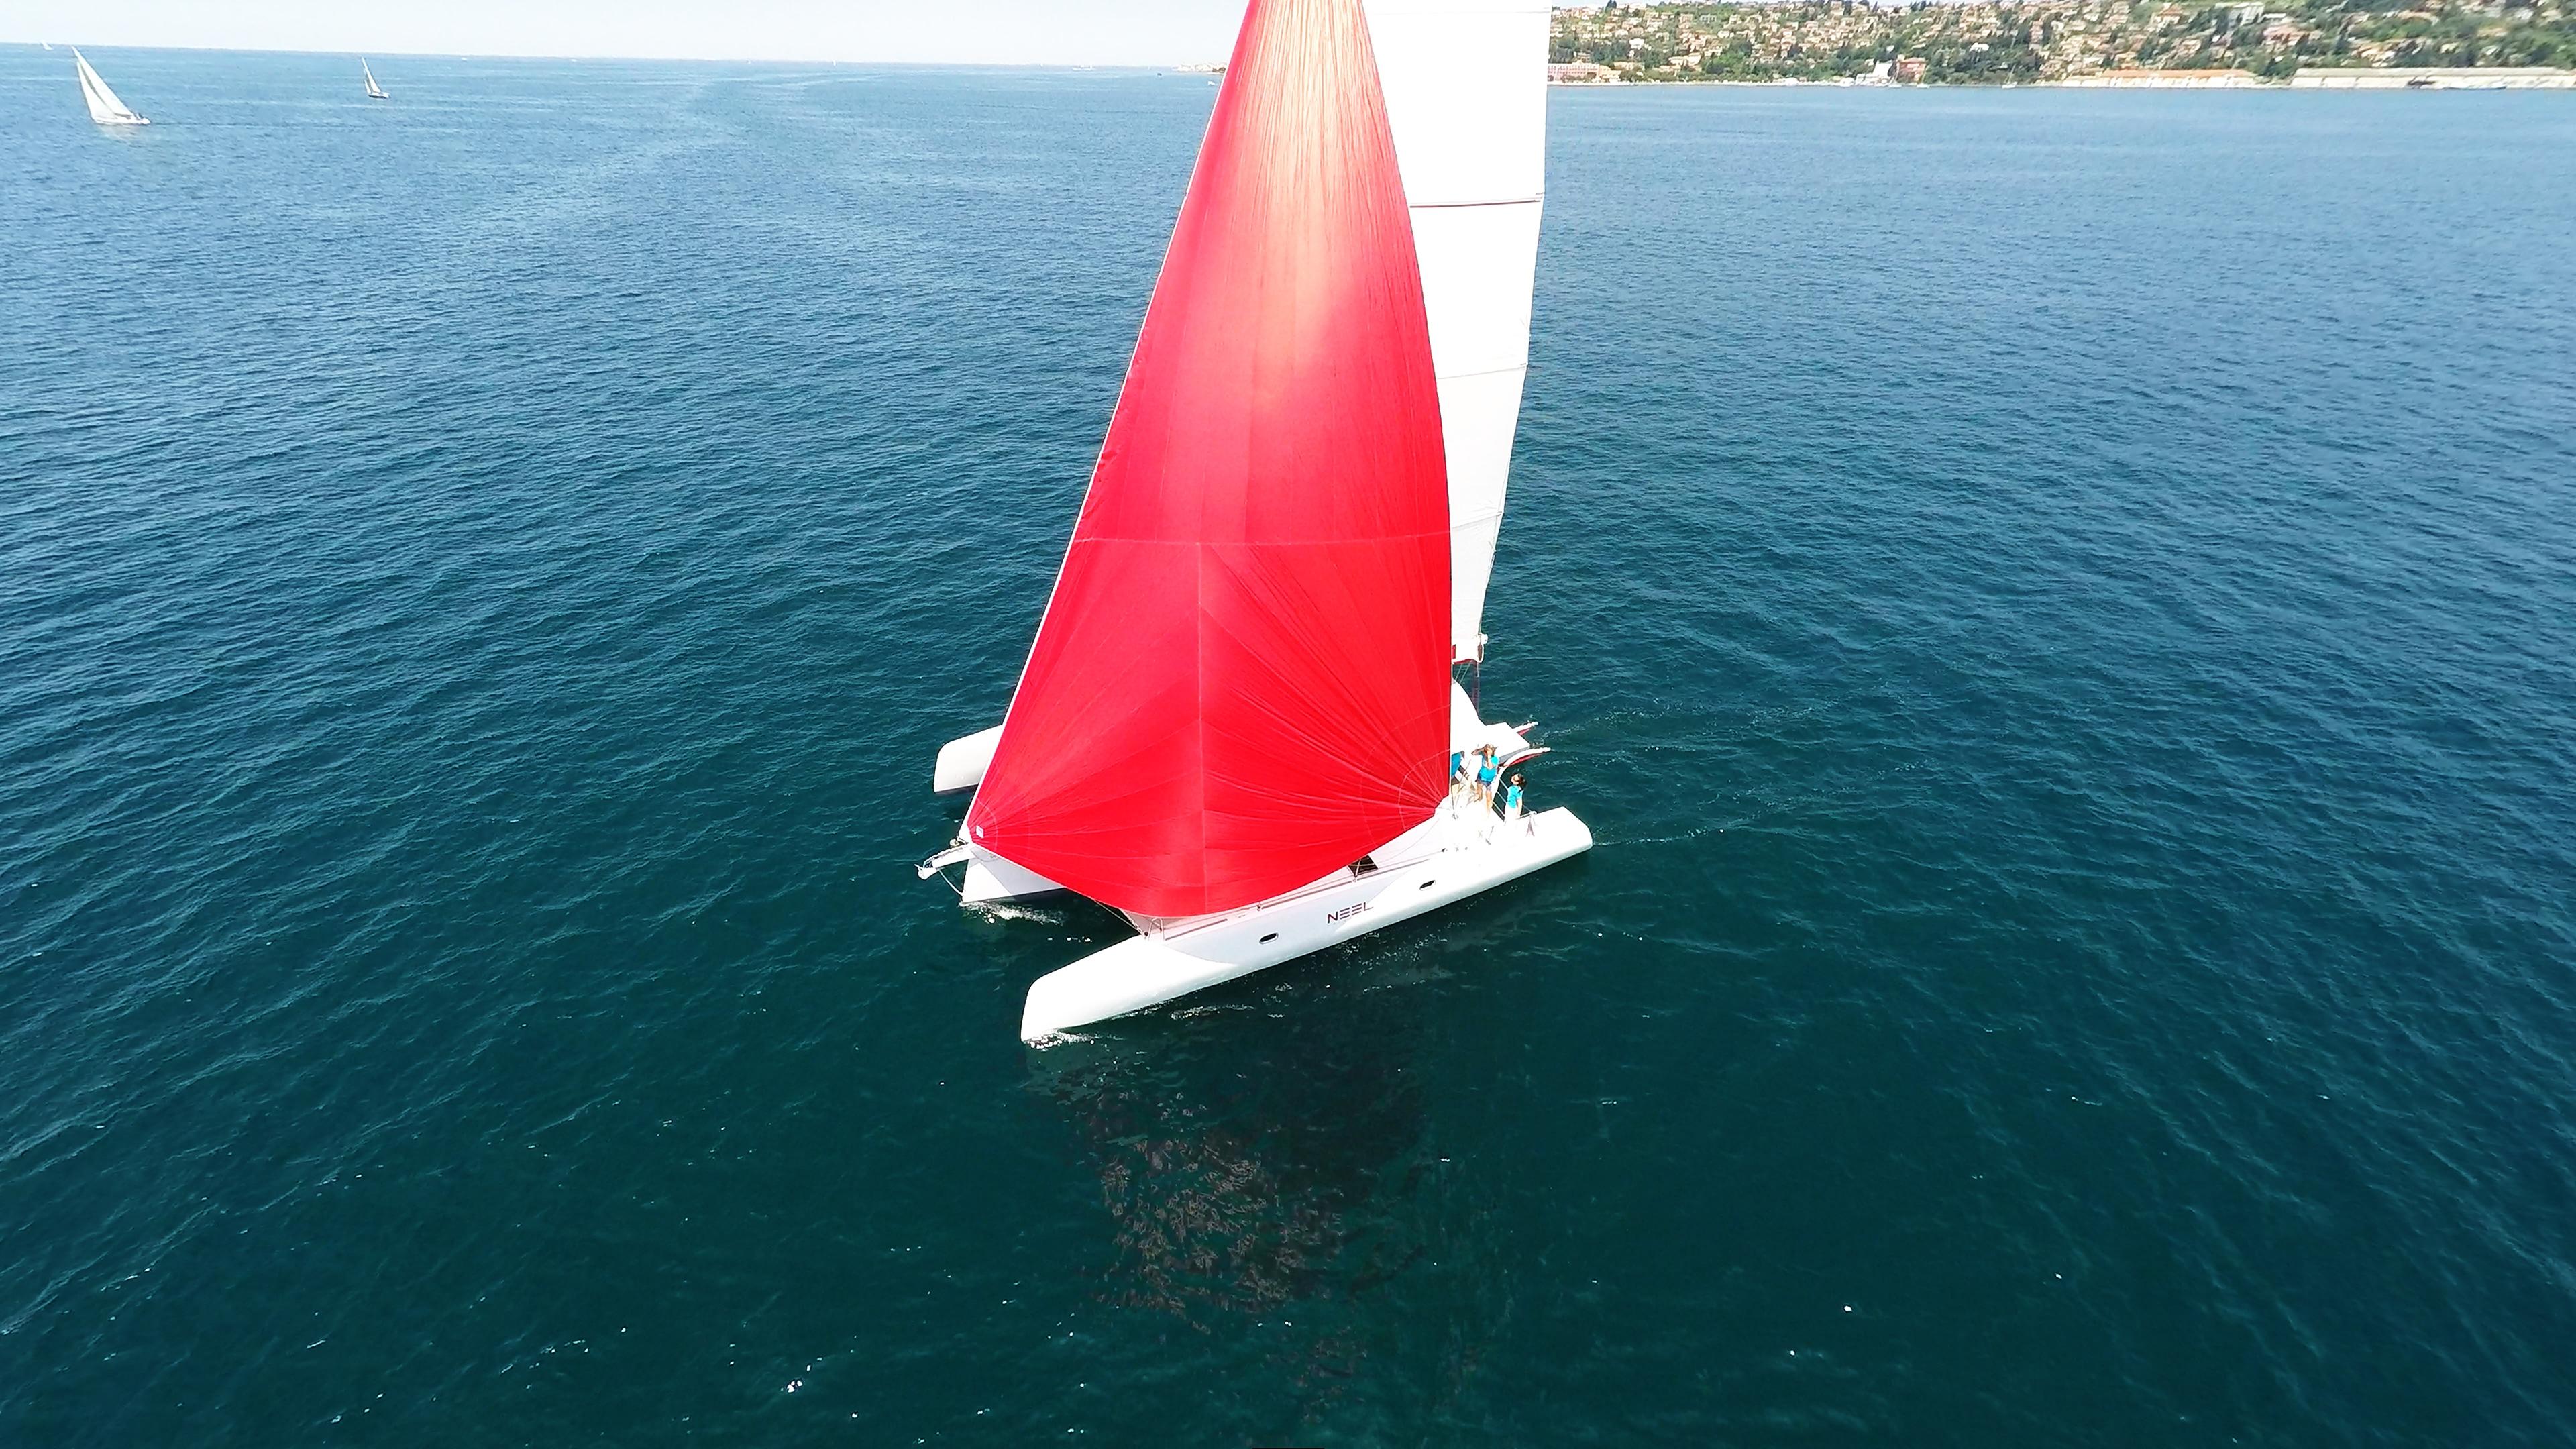 rosso spinnaker-gennaker bianco yacht naviga a vela al blu mare